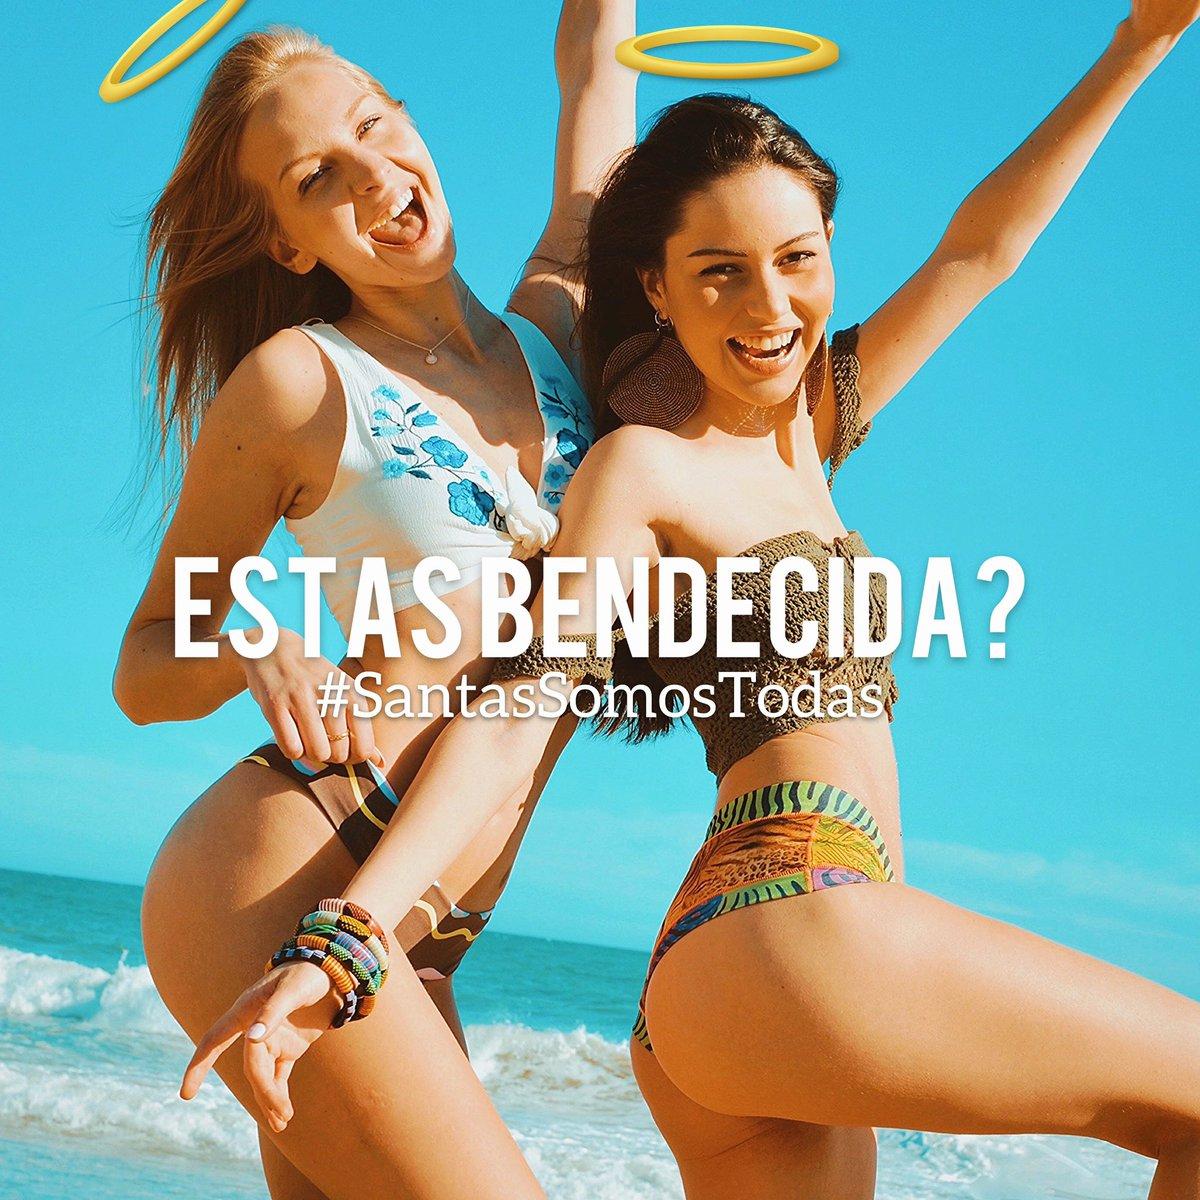 Estas bendecida! 😇? #SantasSomosTodas SS2021  😍💕🌱☀️🌊 #SantaBraguita Esencia femenina est. 2009   #yoga #pilates #poledance #padel #Frida #danza #surf #ski #beach #playa #Verano #Summer #tattoo #Ibiza #bikini & #braguita en una sola prenda.📍#Barcelona